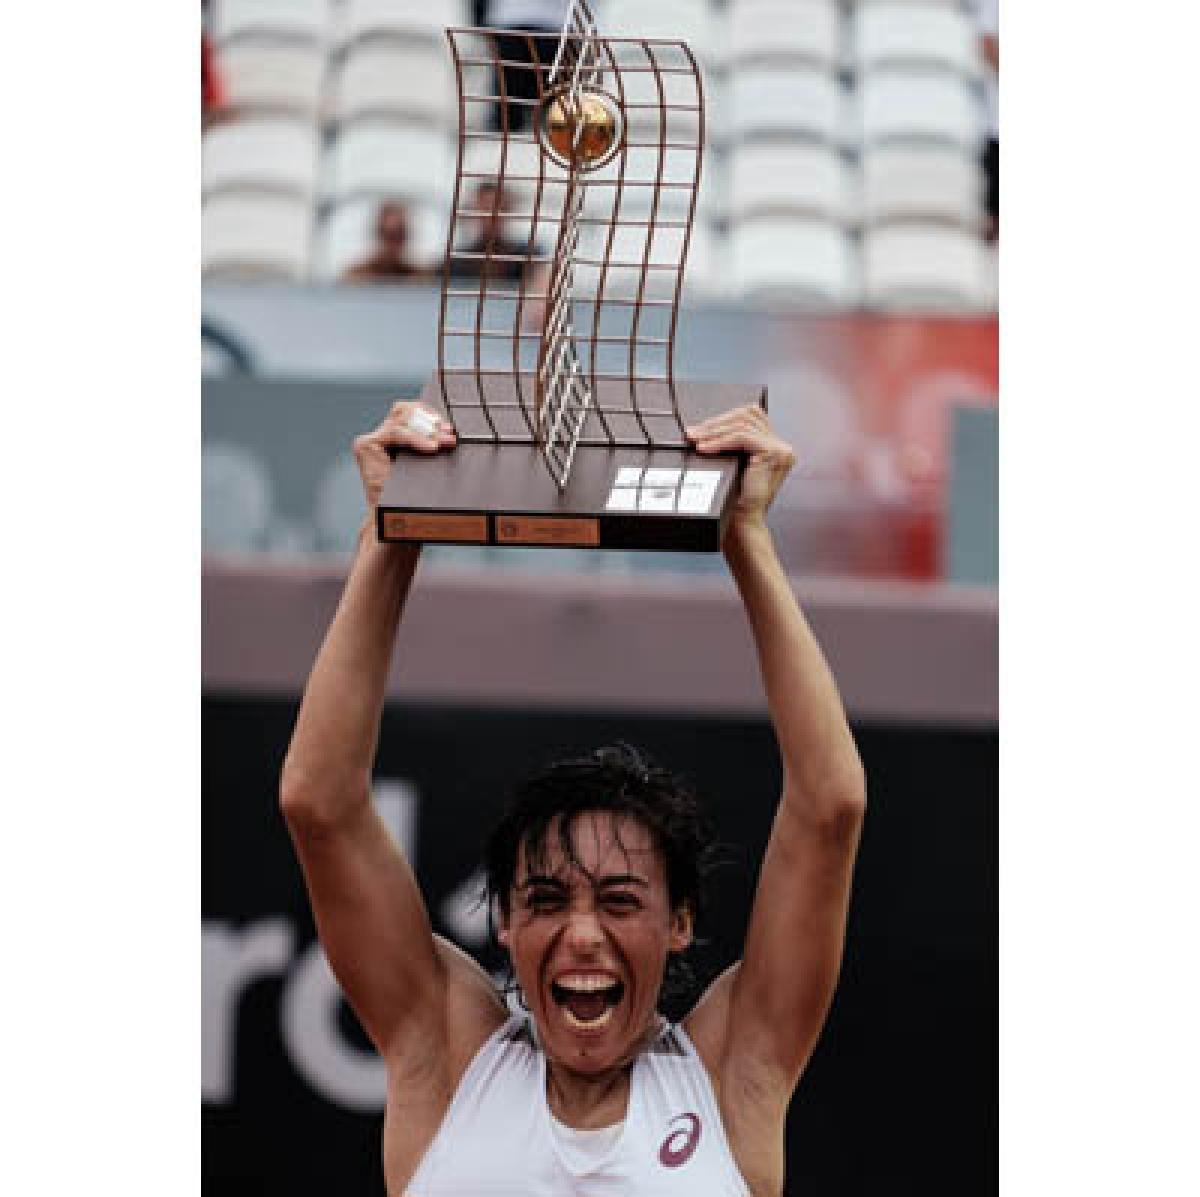 Francesca Schiavone, 35; wins Rio title